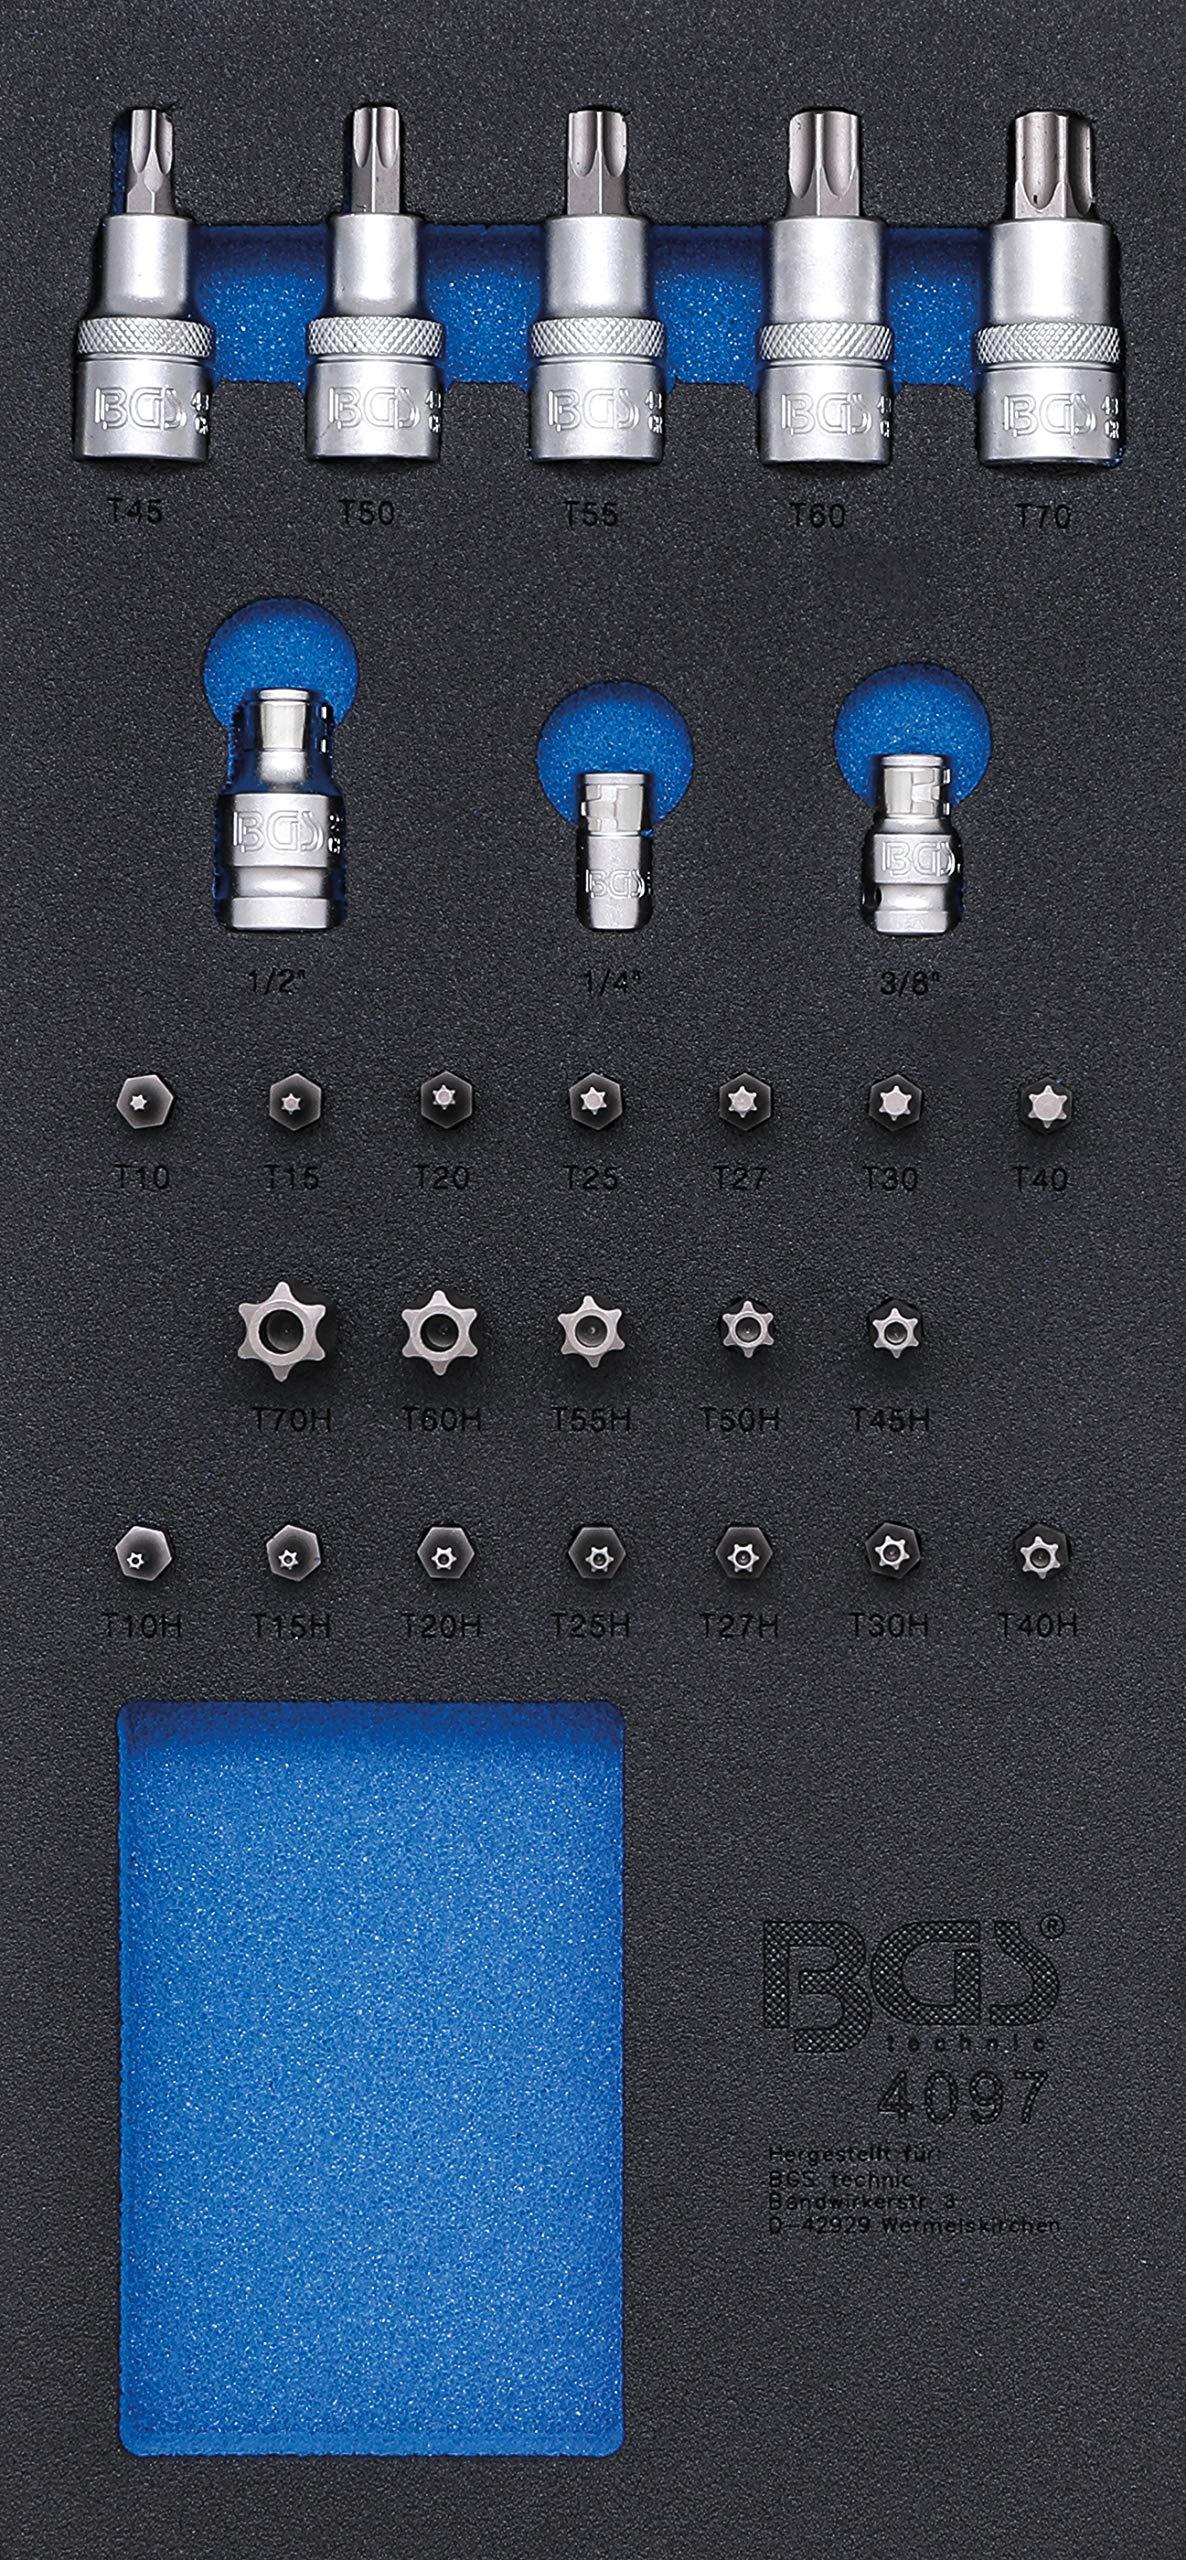 BGS Workshop Trolley 1/3Insert Bit and Screwdriver Bit Set, 27-Piece 4097 by BGS